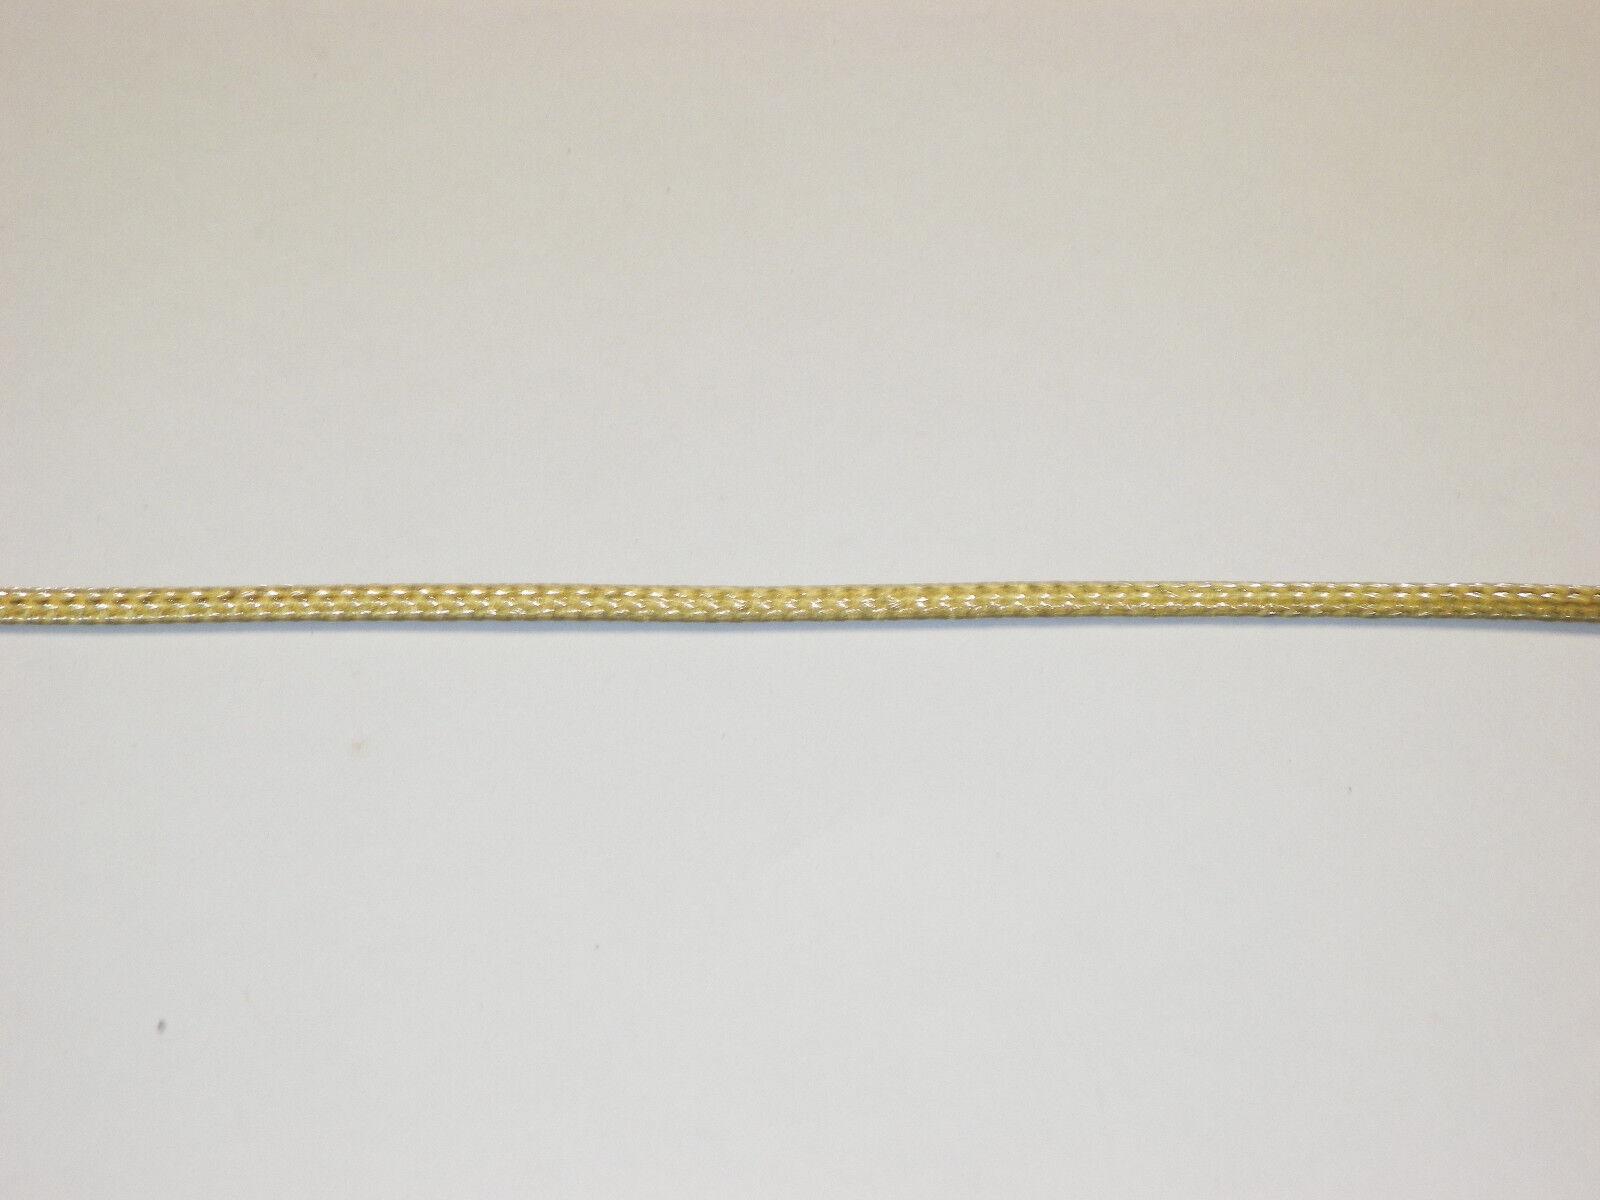 BRAIDED BRASS EXPANDABLE Flex Sleeve Wiring Harness Loom Flexable ...